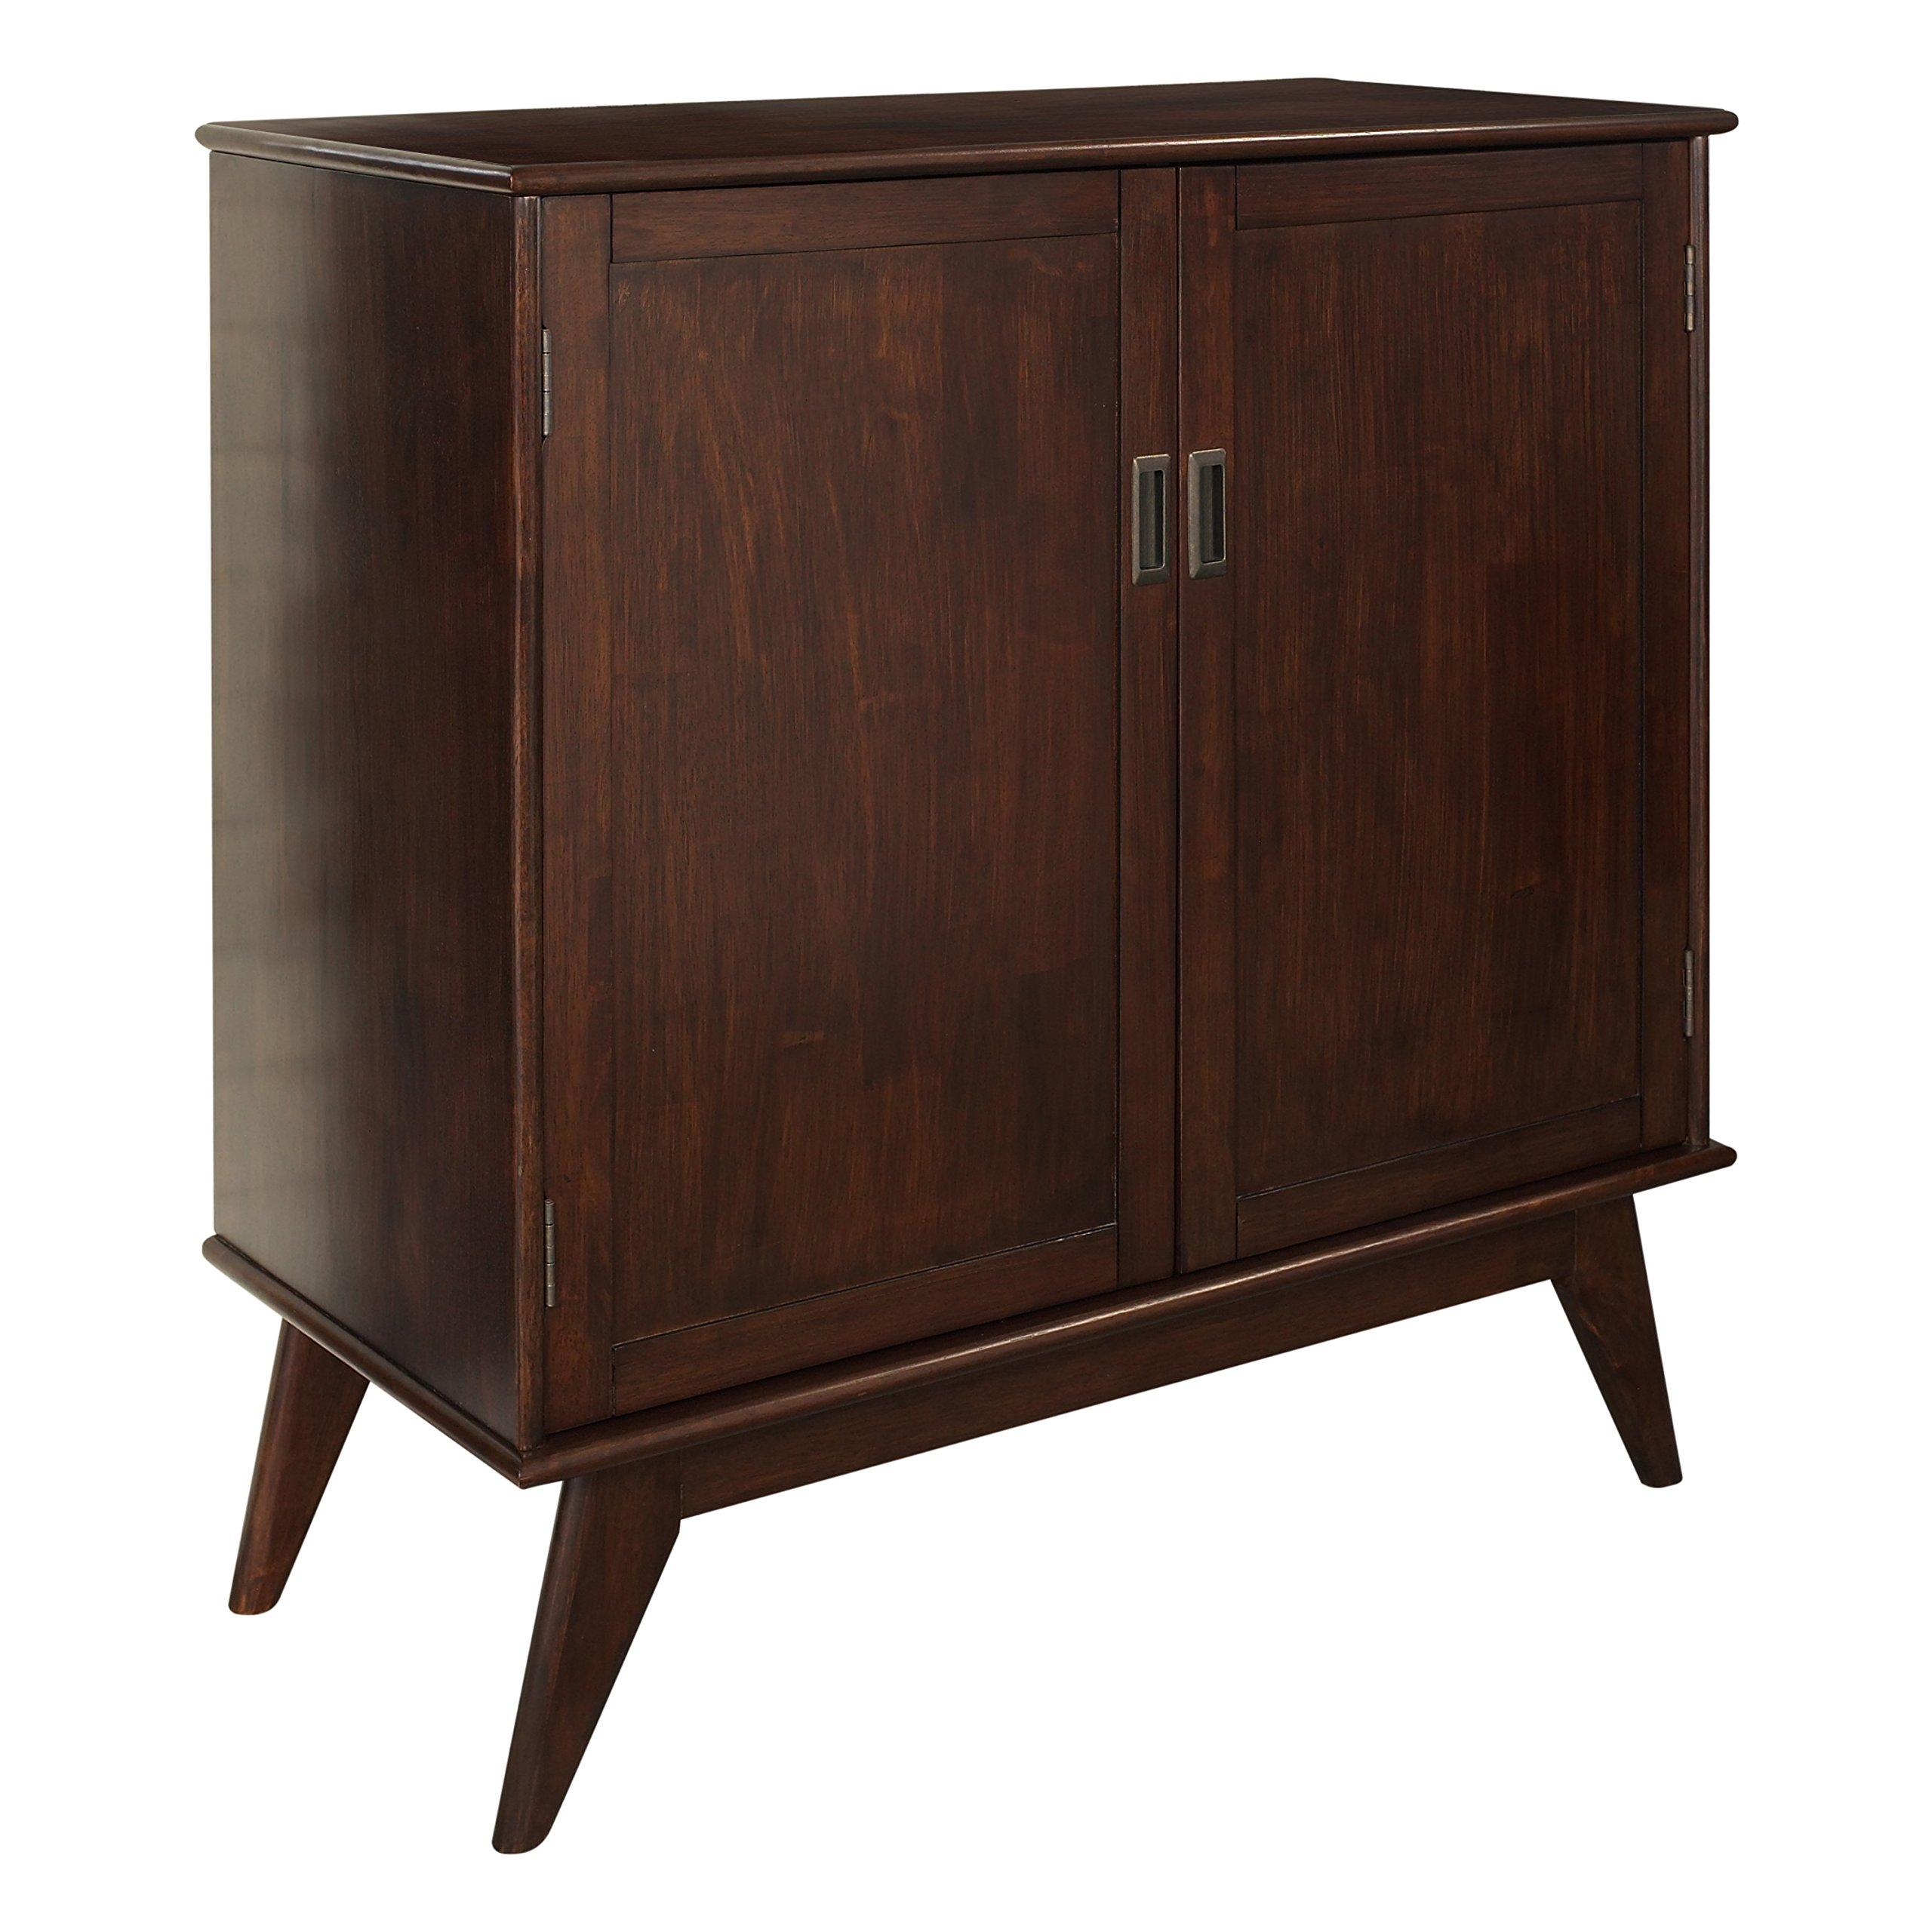 Simpli Home Draper Mid Century Solid Hardwood Storage Cabinet, Medium, Auburn Brown by Simpli Home (Image #1)